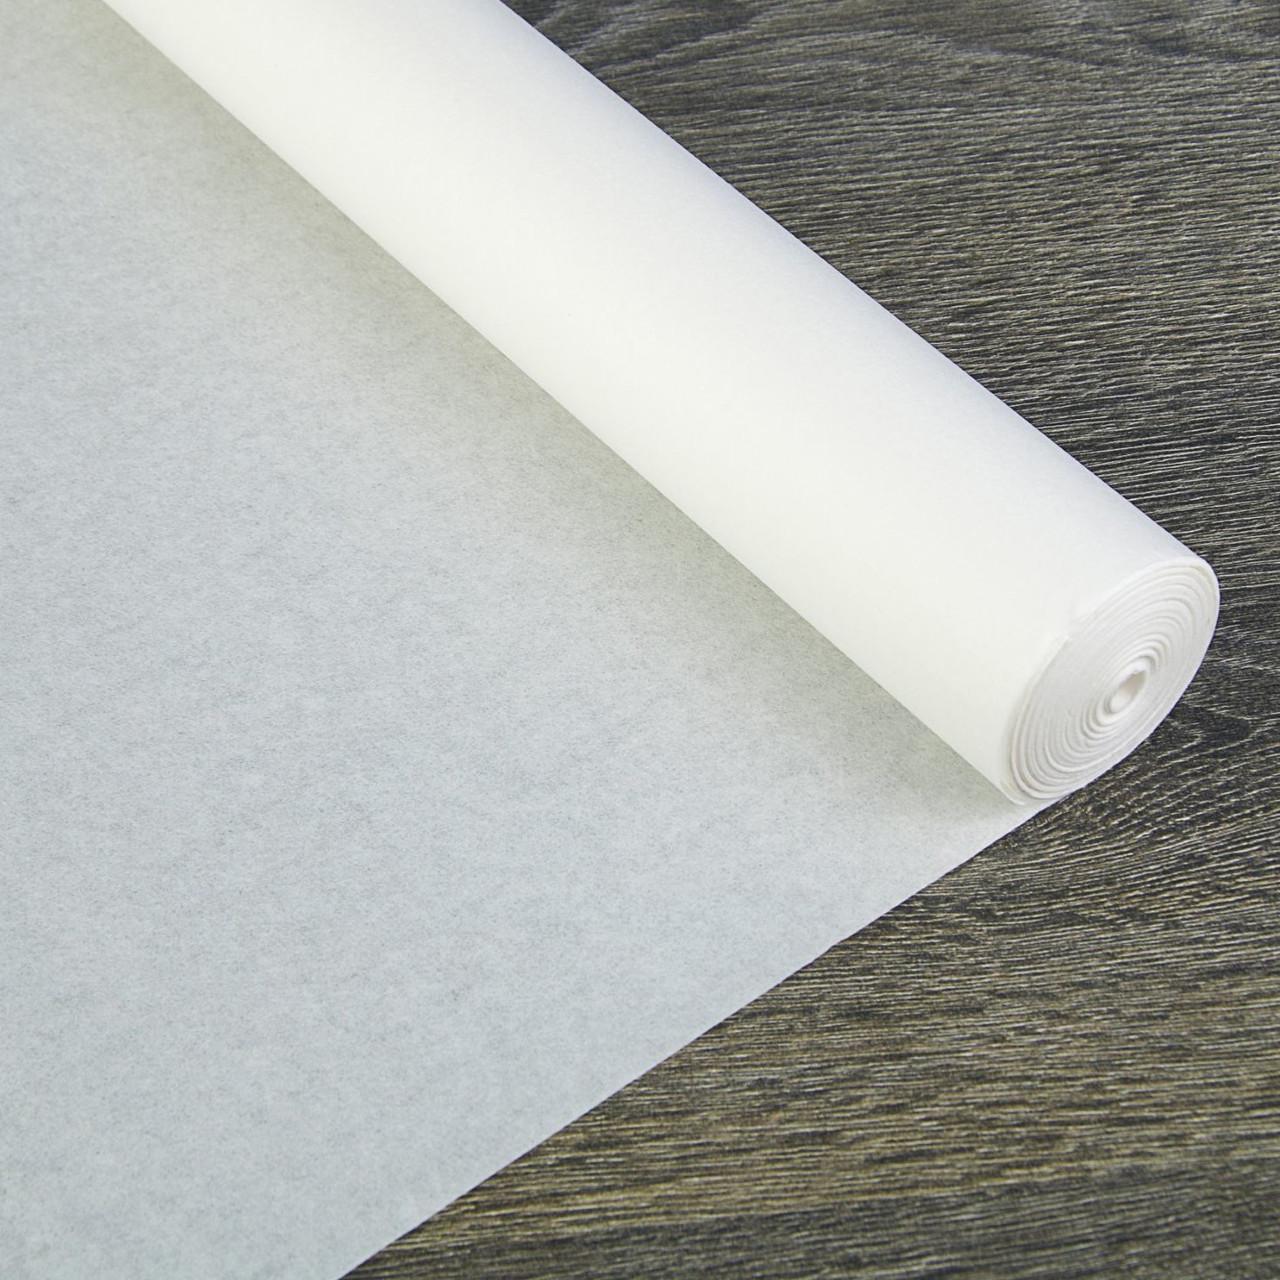 Бумага рисовая ширина - 460 мм, длина рулона, 25 м, 35 г/м²